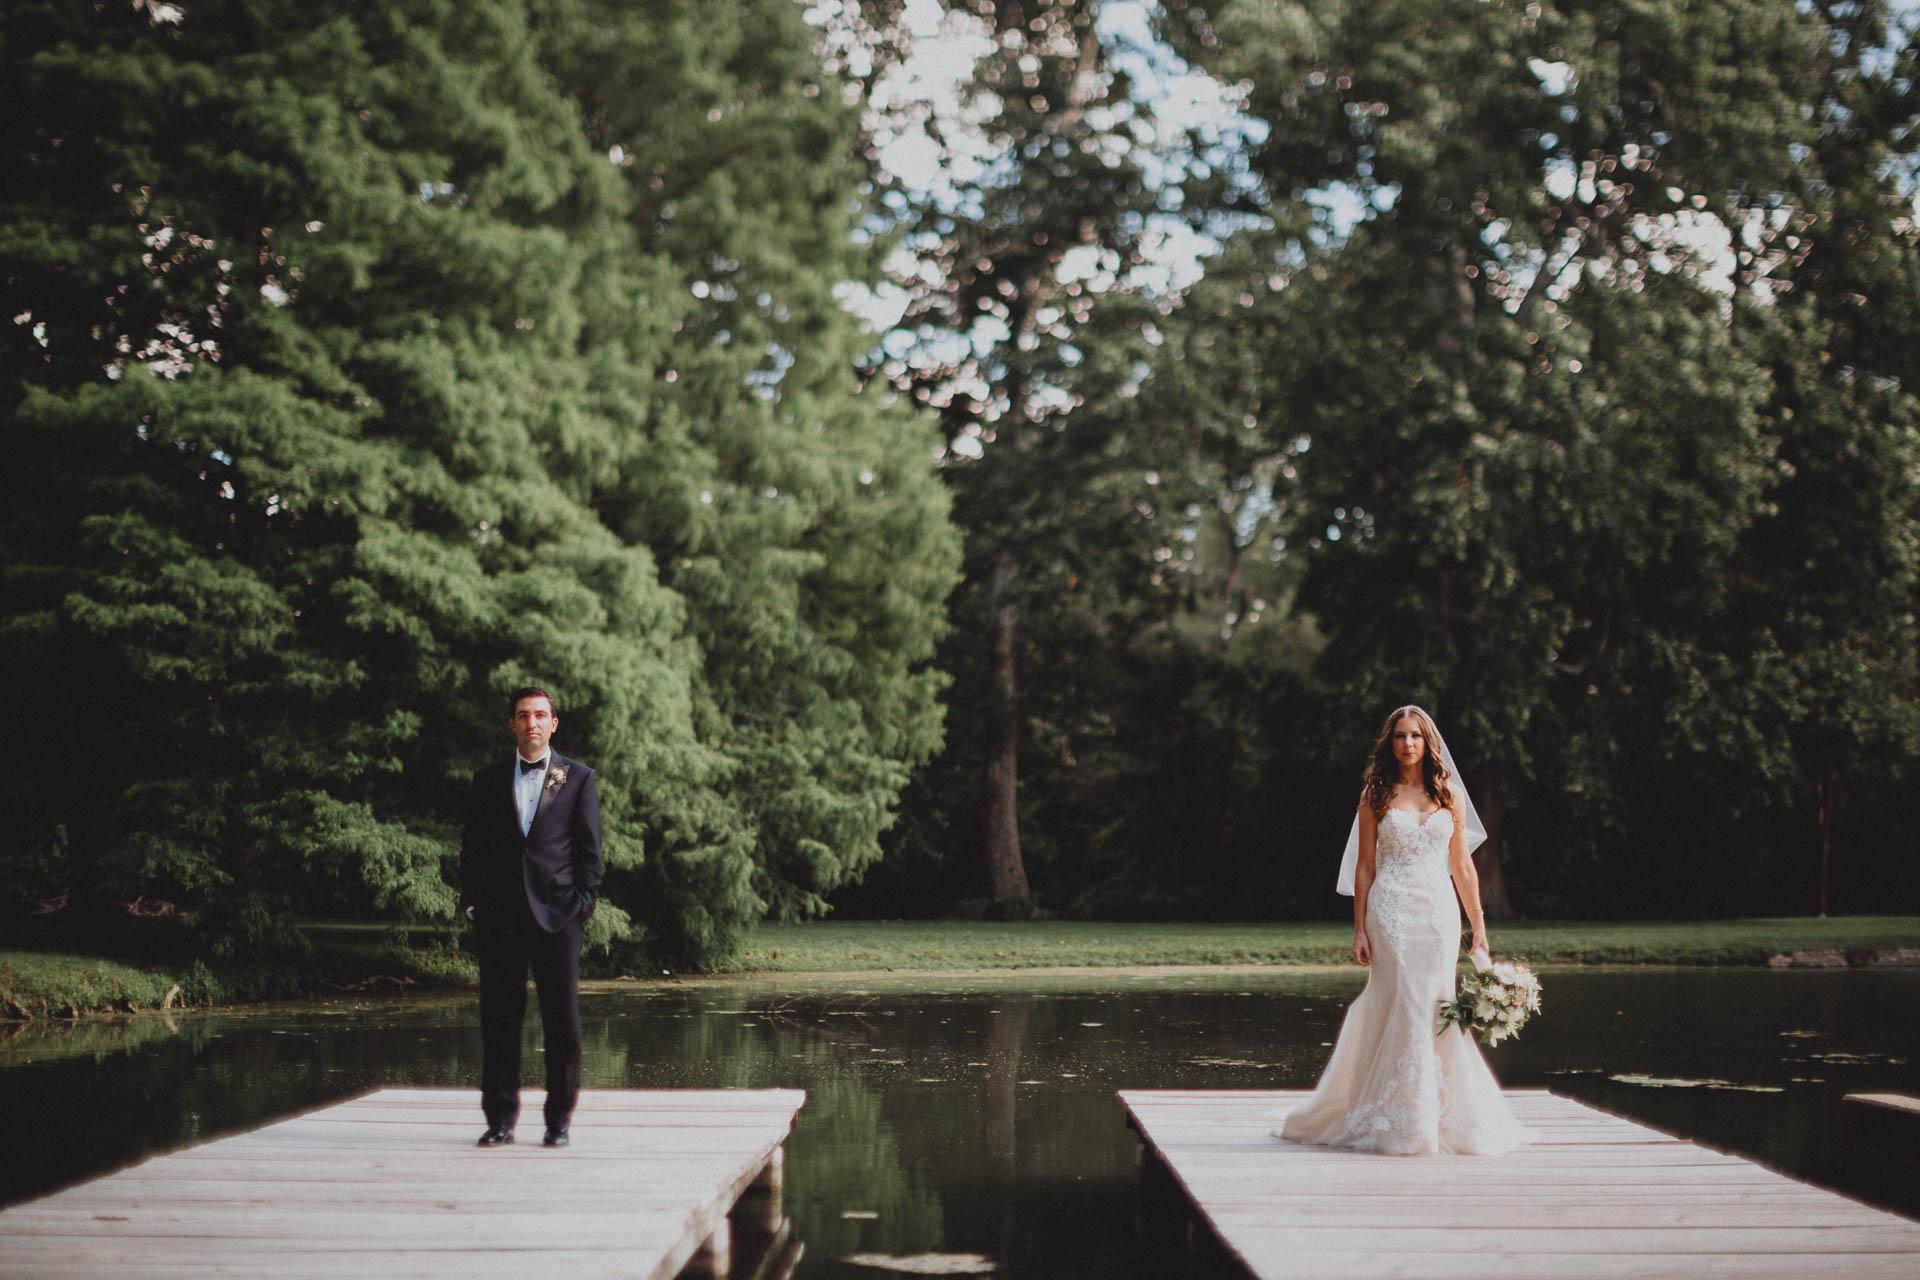 Keri-Joseph-Top-of-the-Market-Wedding-113@2x.jpg